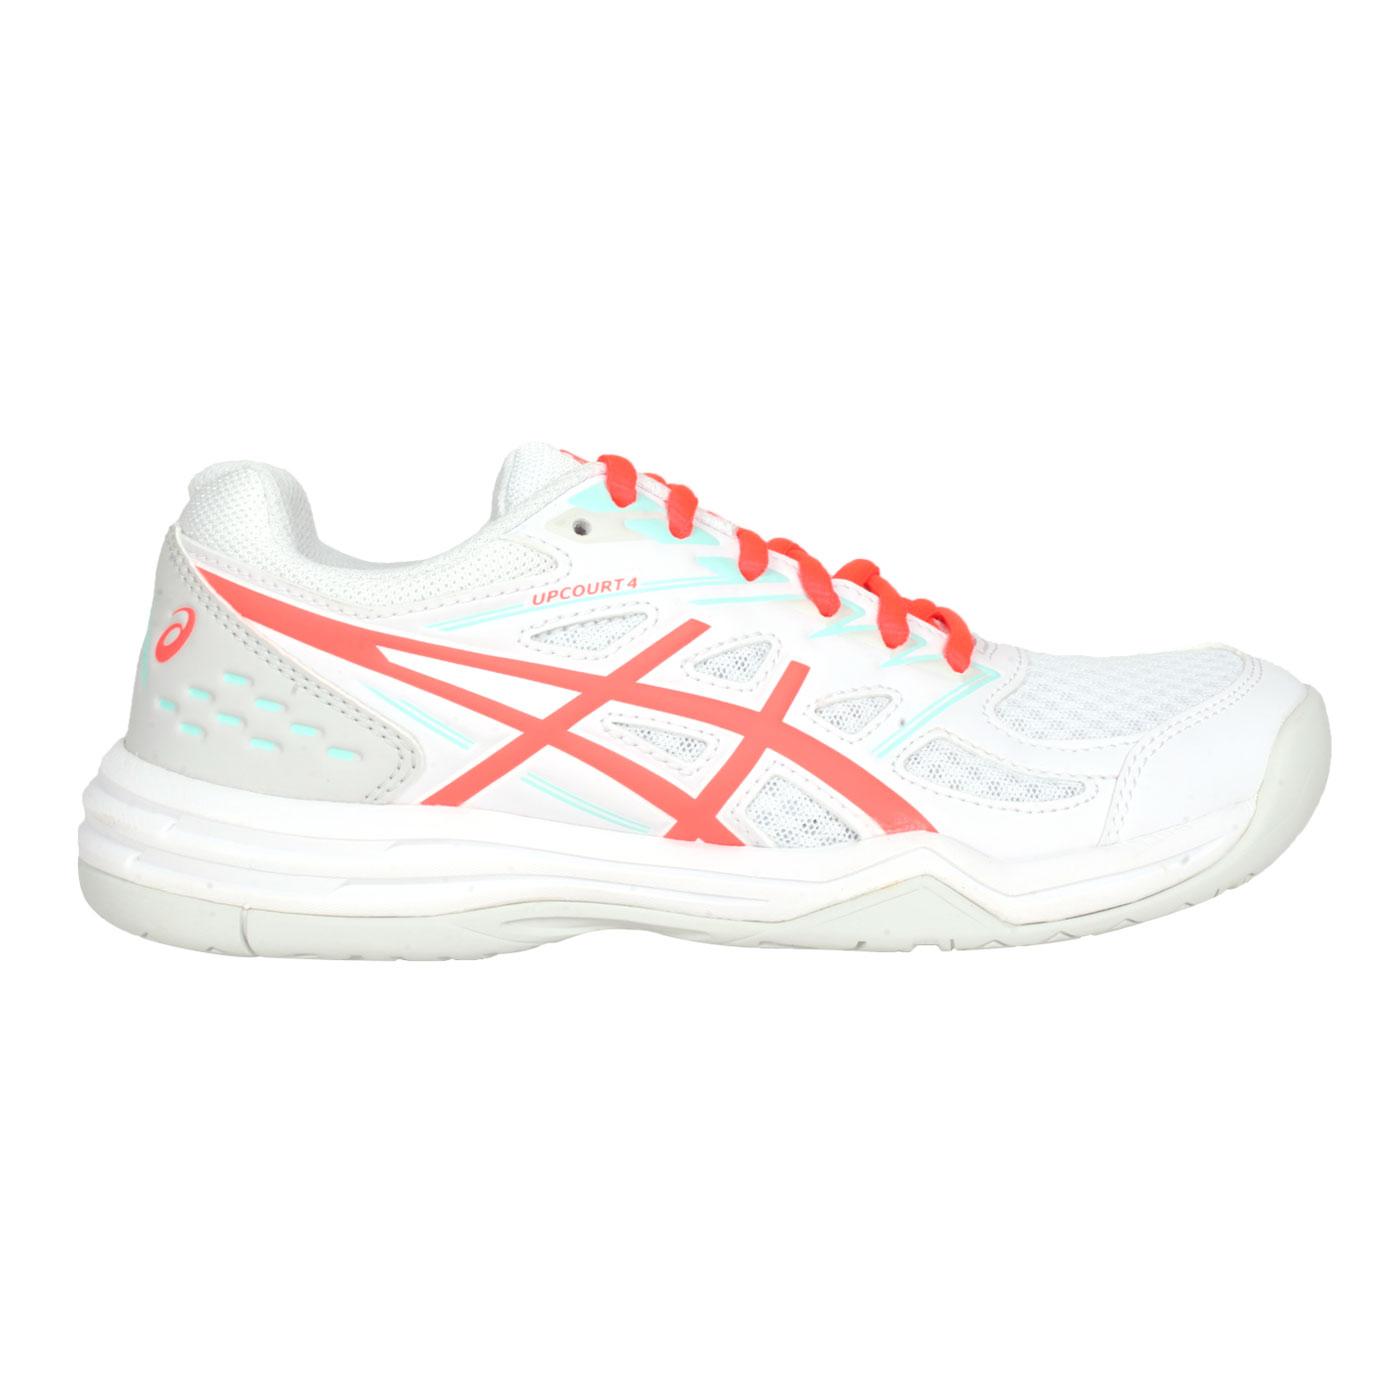 ASICS 女款排羽球鞋  @UPCOURT 4@1072A055-960